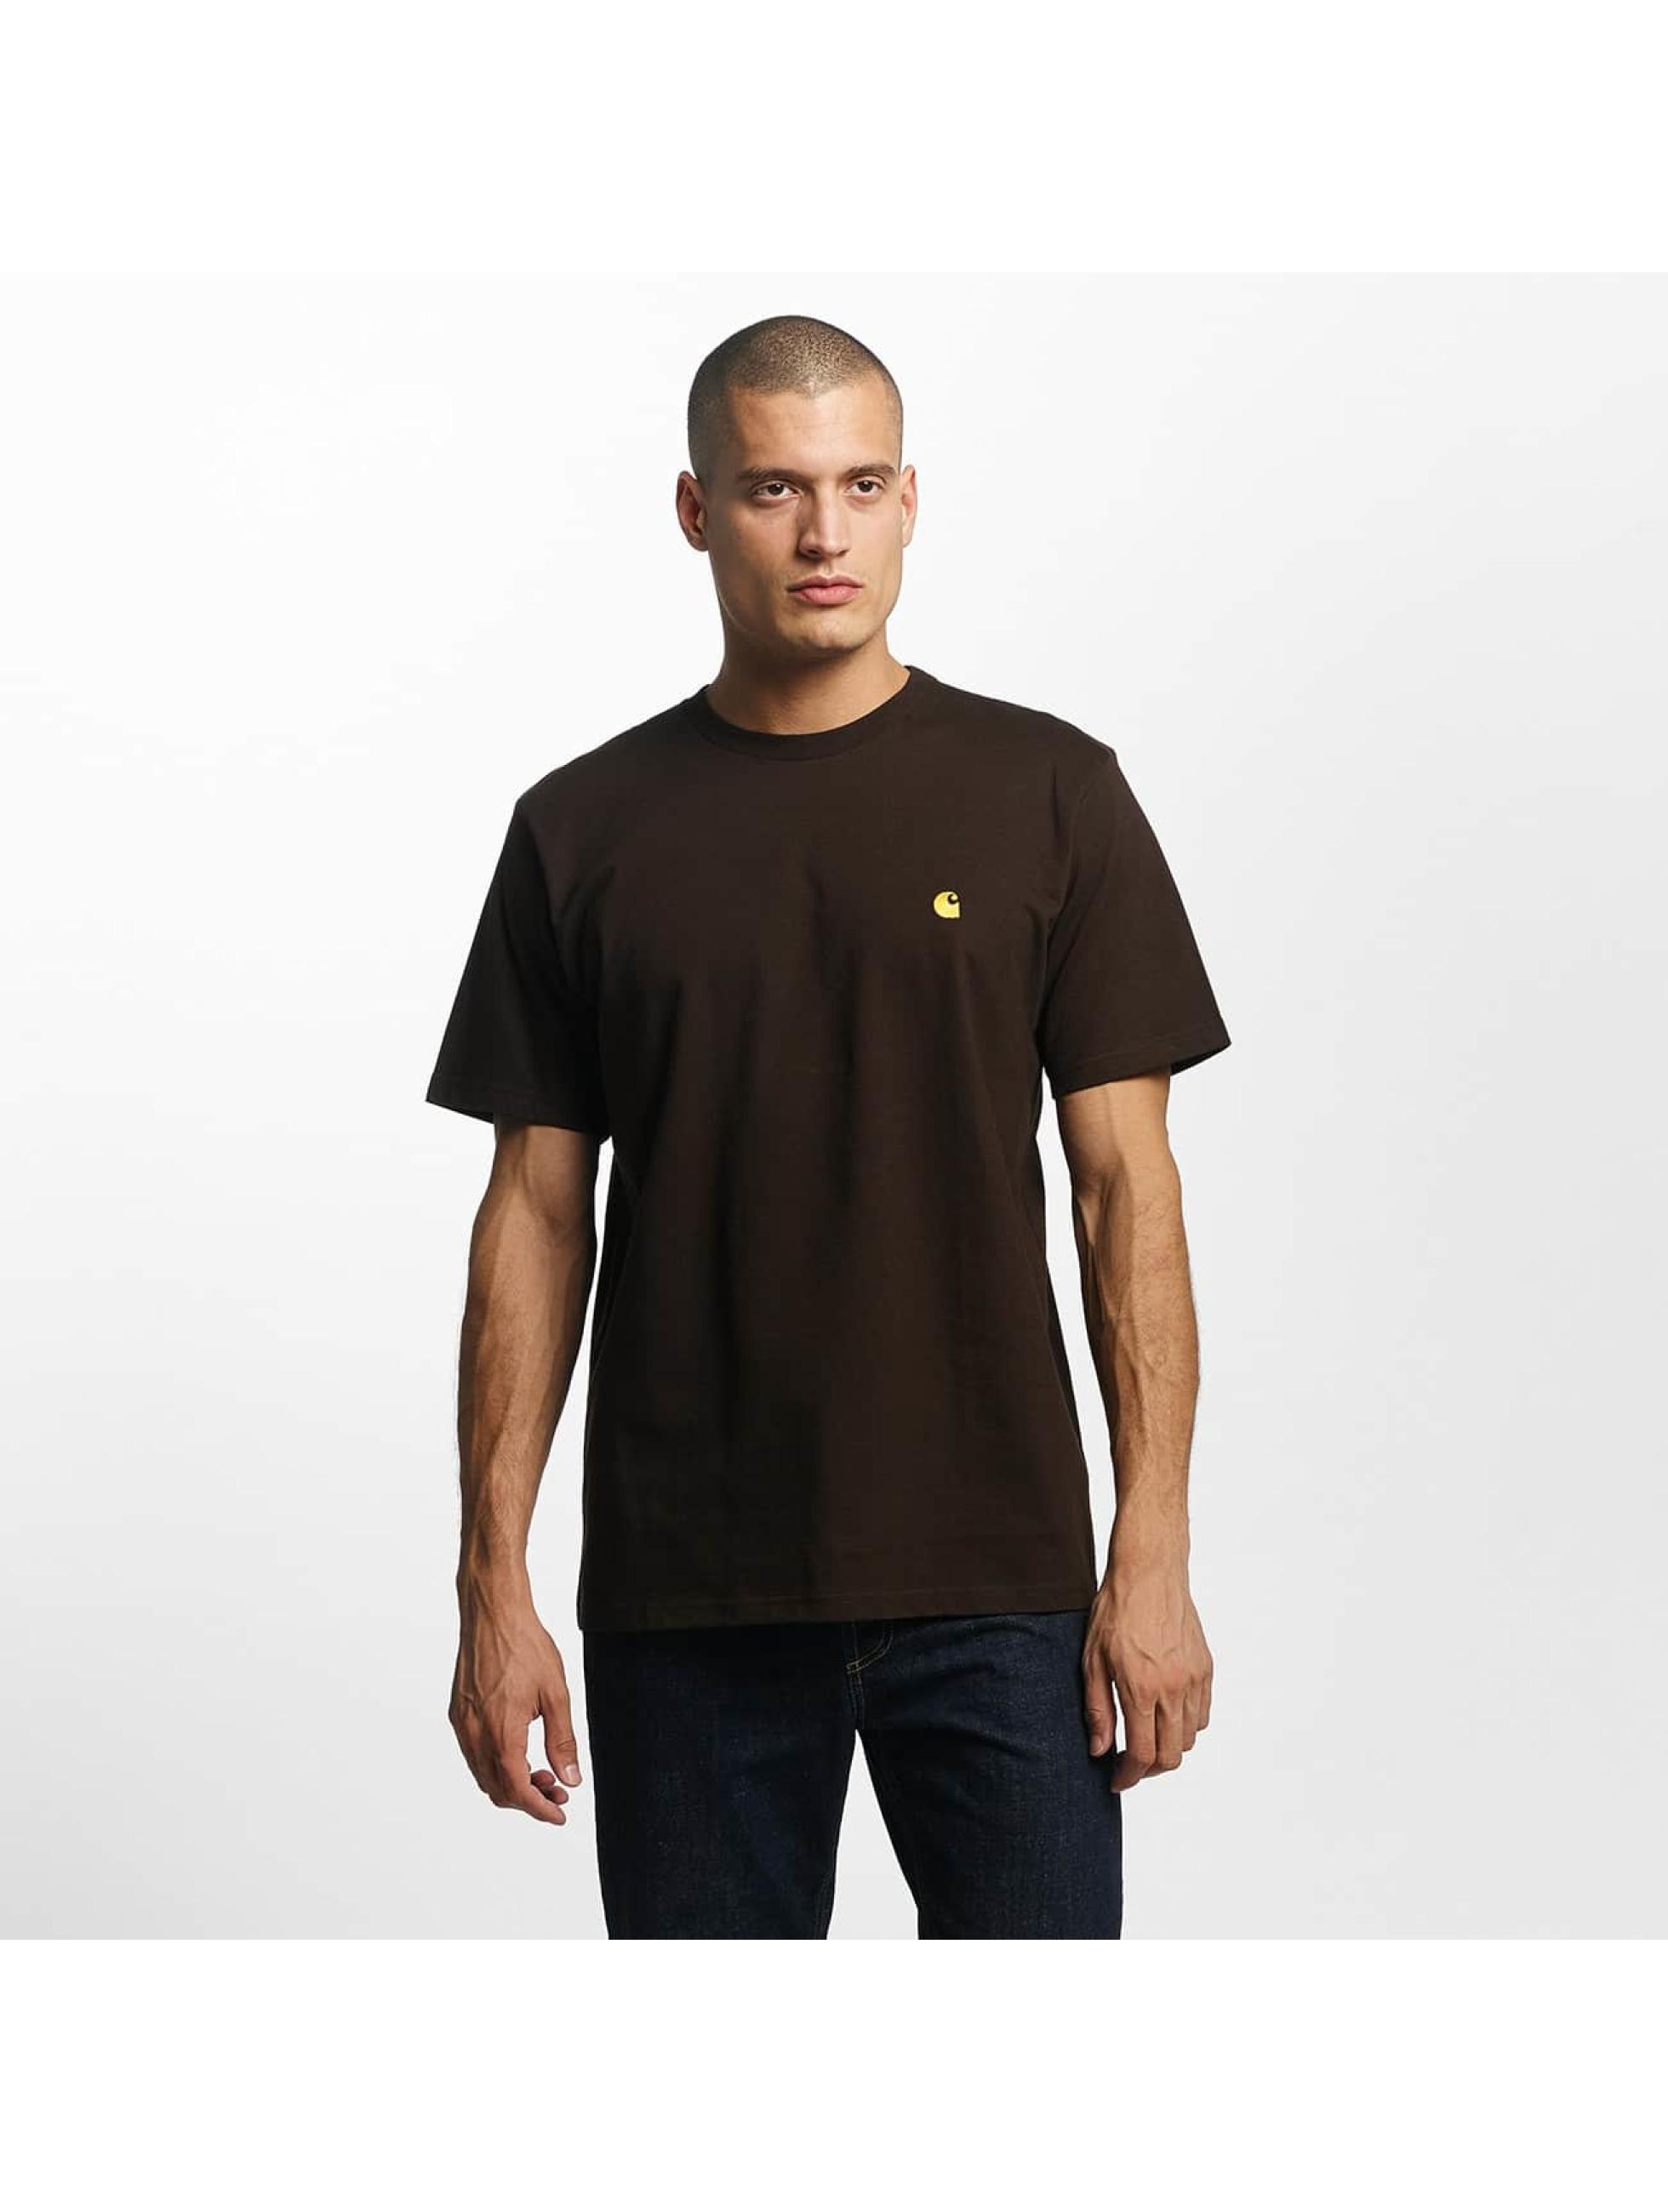 Carhartt WIP Männer T-Shirt Chase in braun